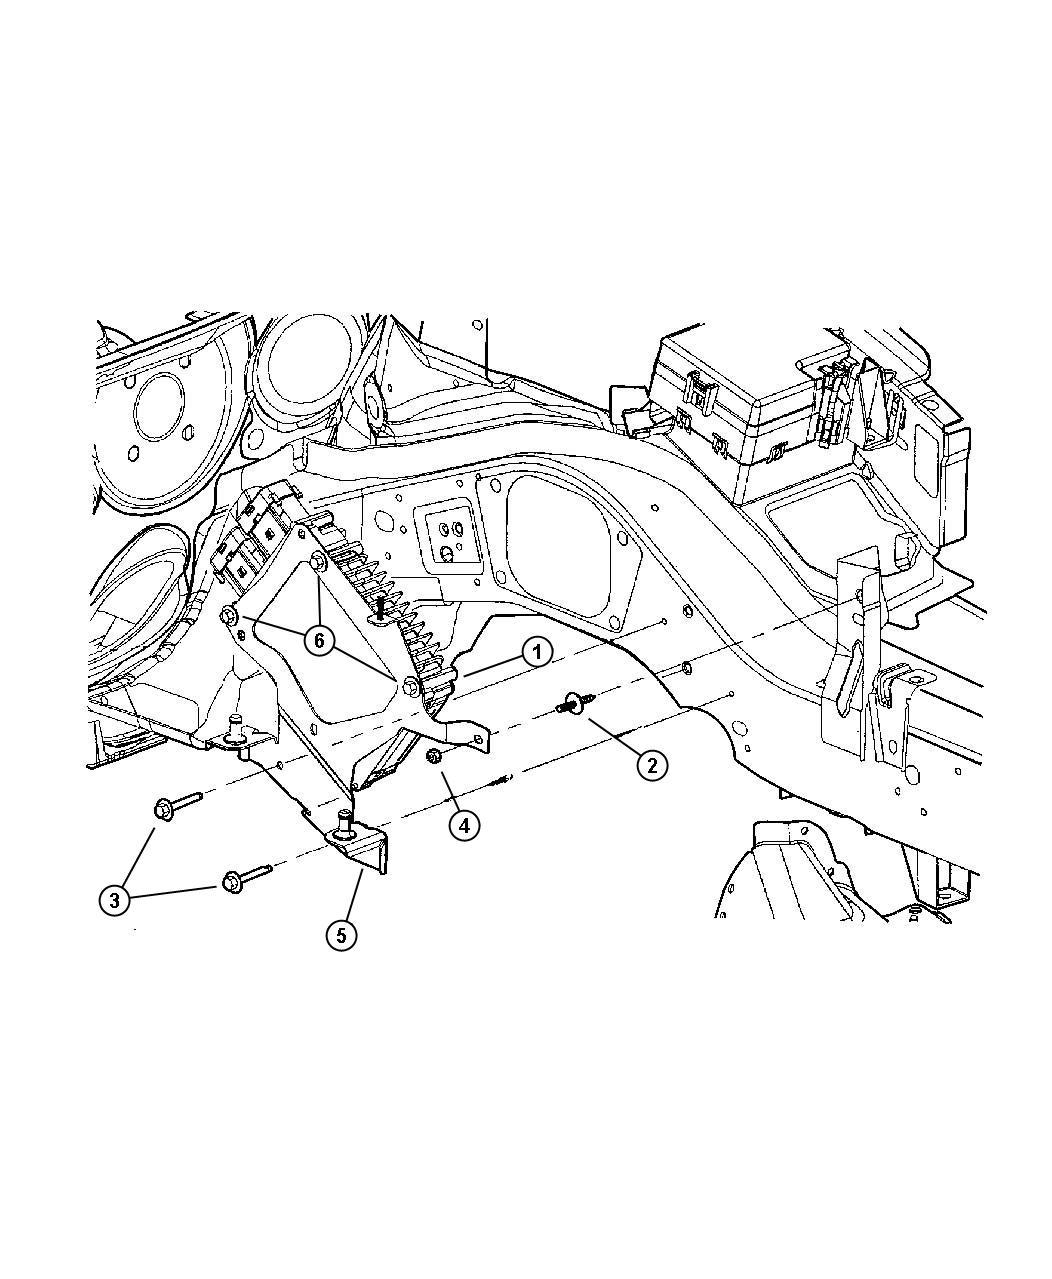 Dodge Stratus Se Sedan 2 7l V6 24v W Active Intake 4 Spd Automatic 41te Engine Control